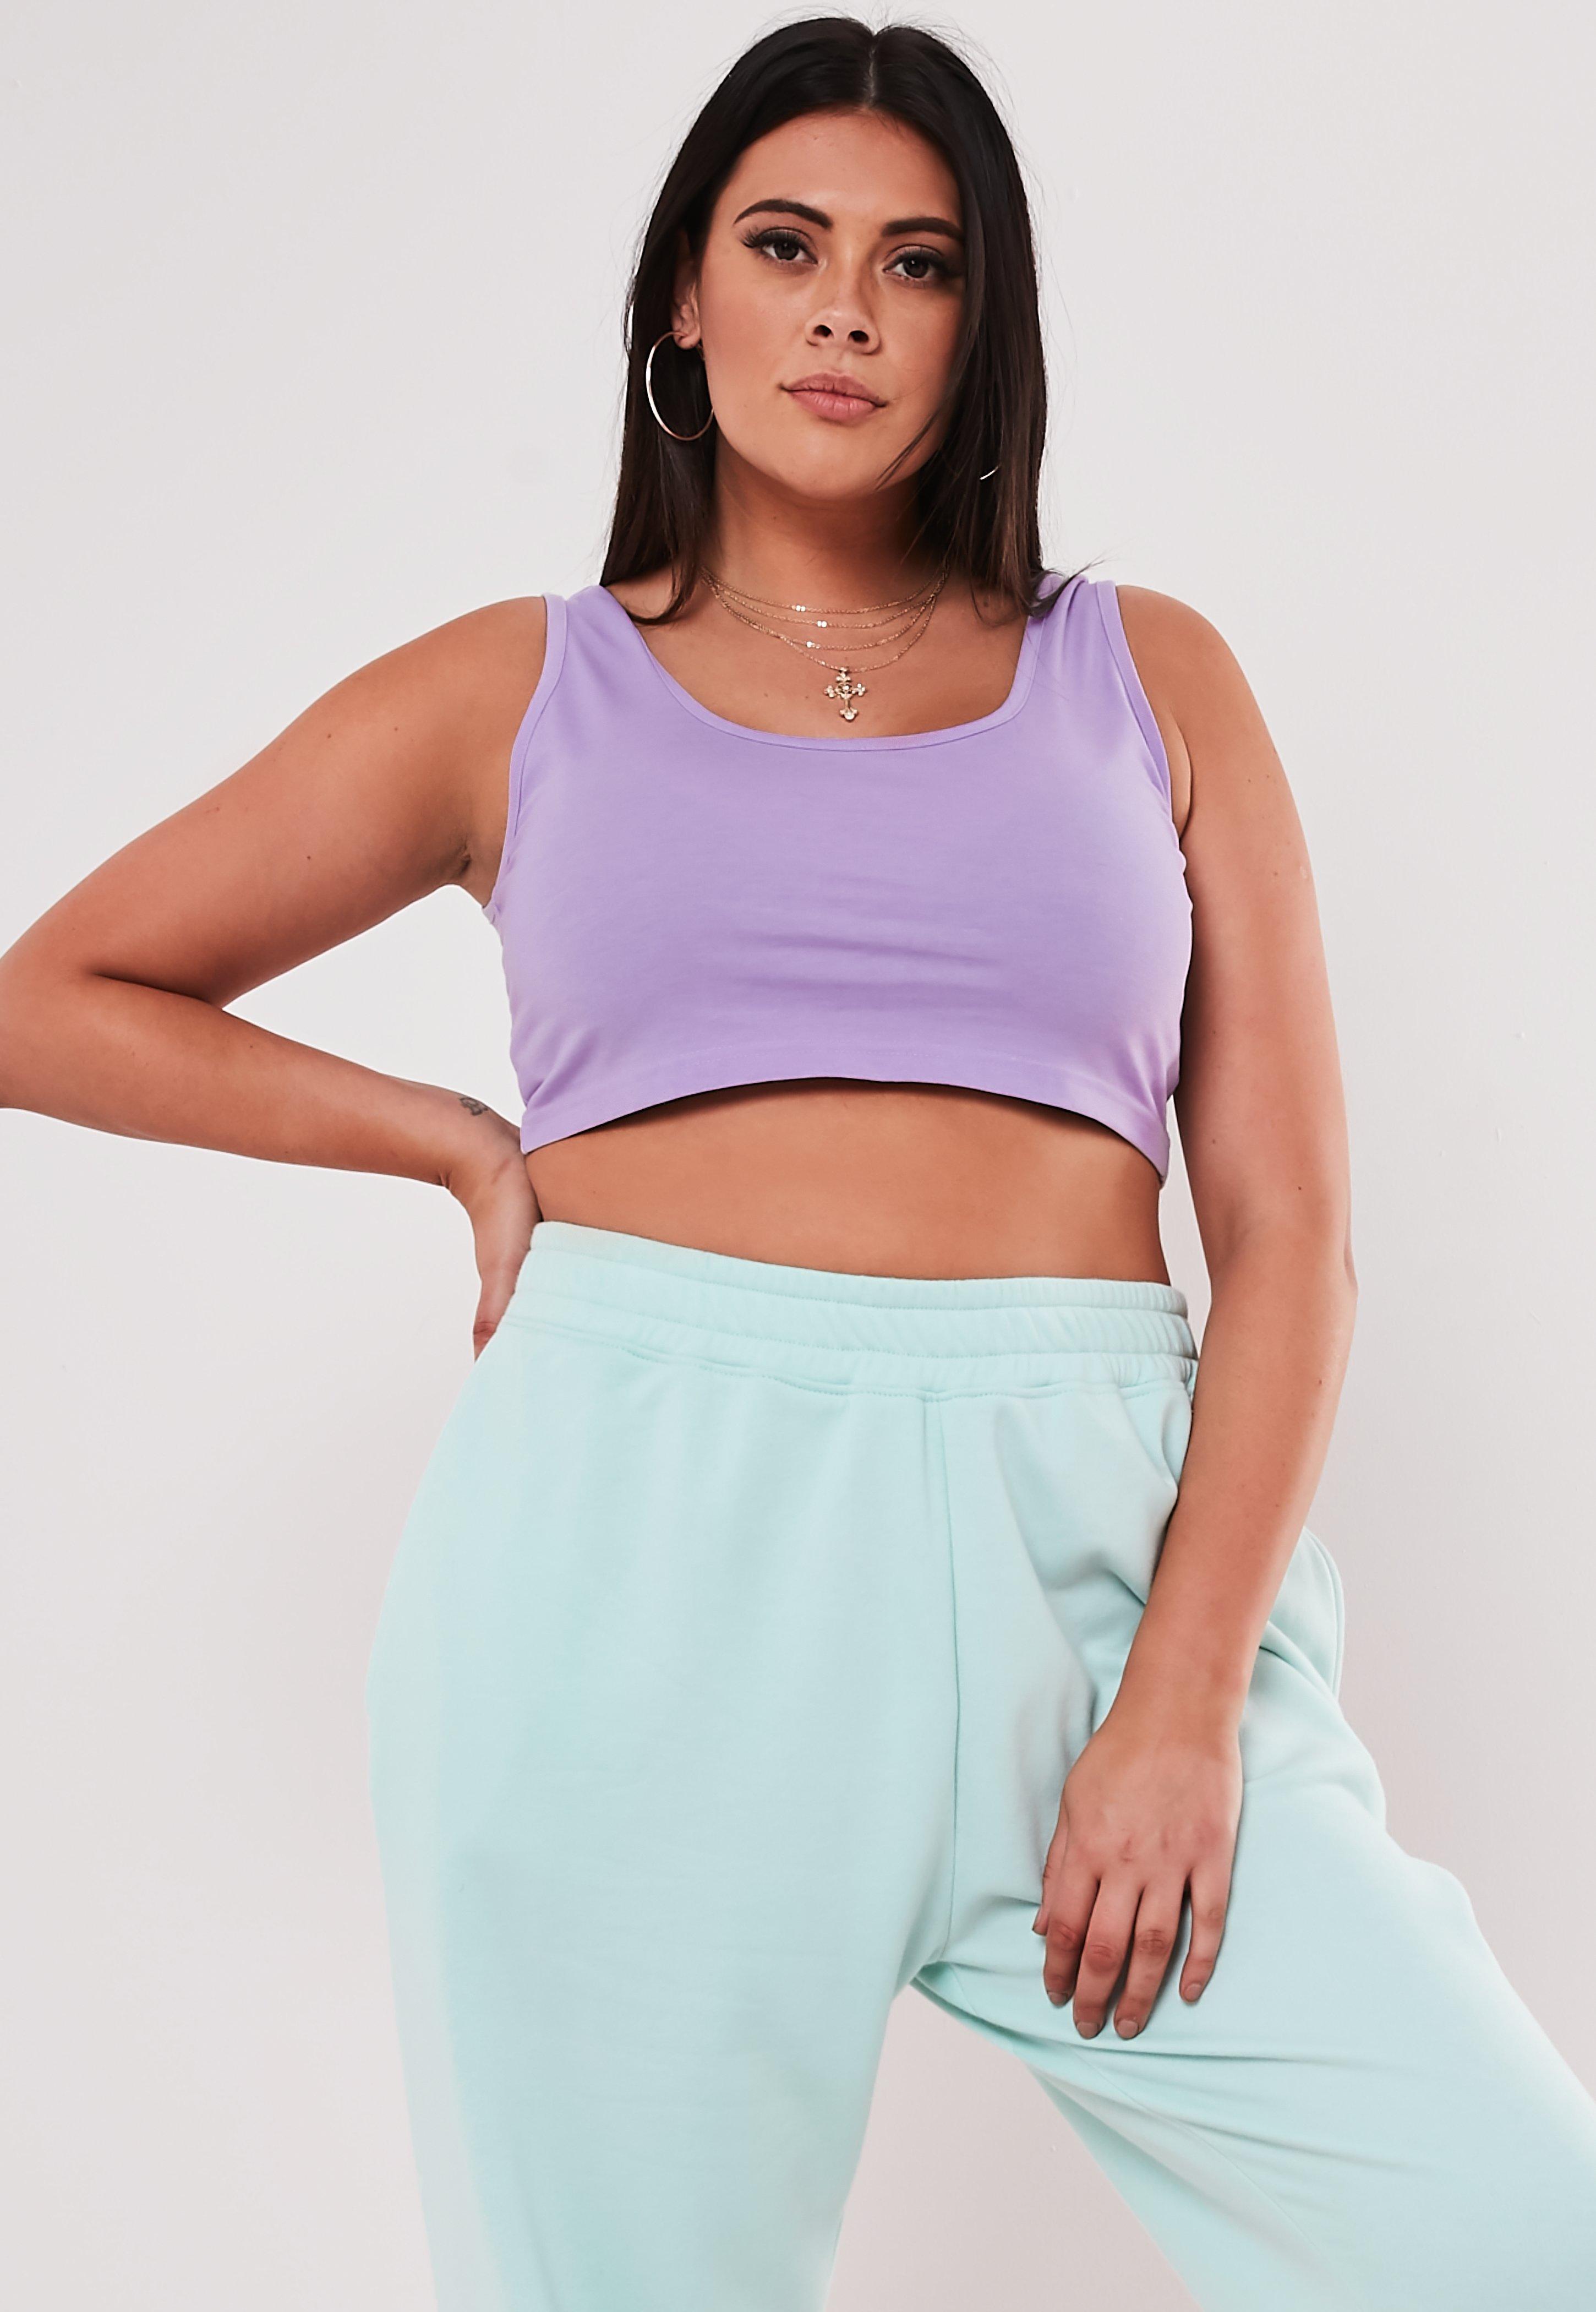 96fdb097919 Plus Size Clothing   Plus Size Women s Fashion